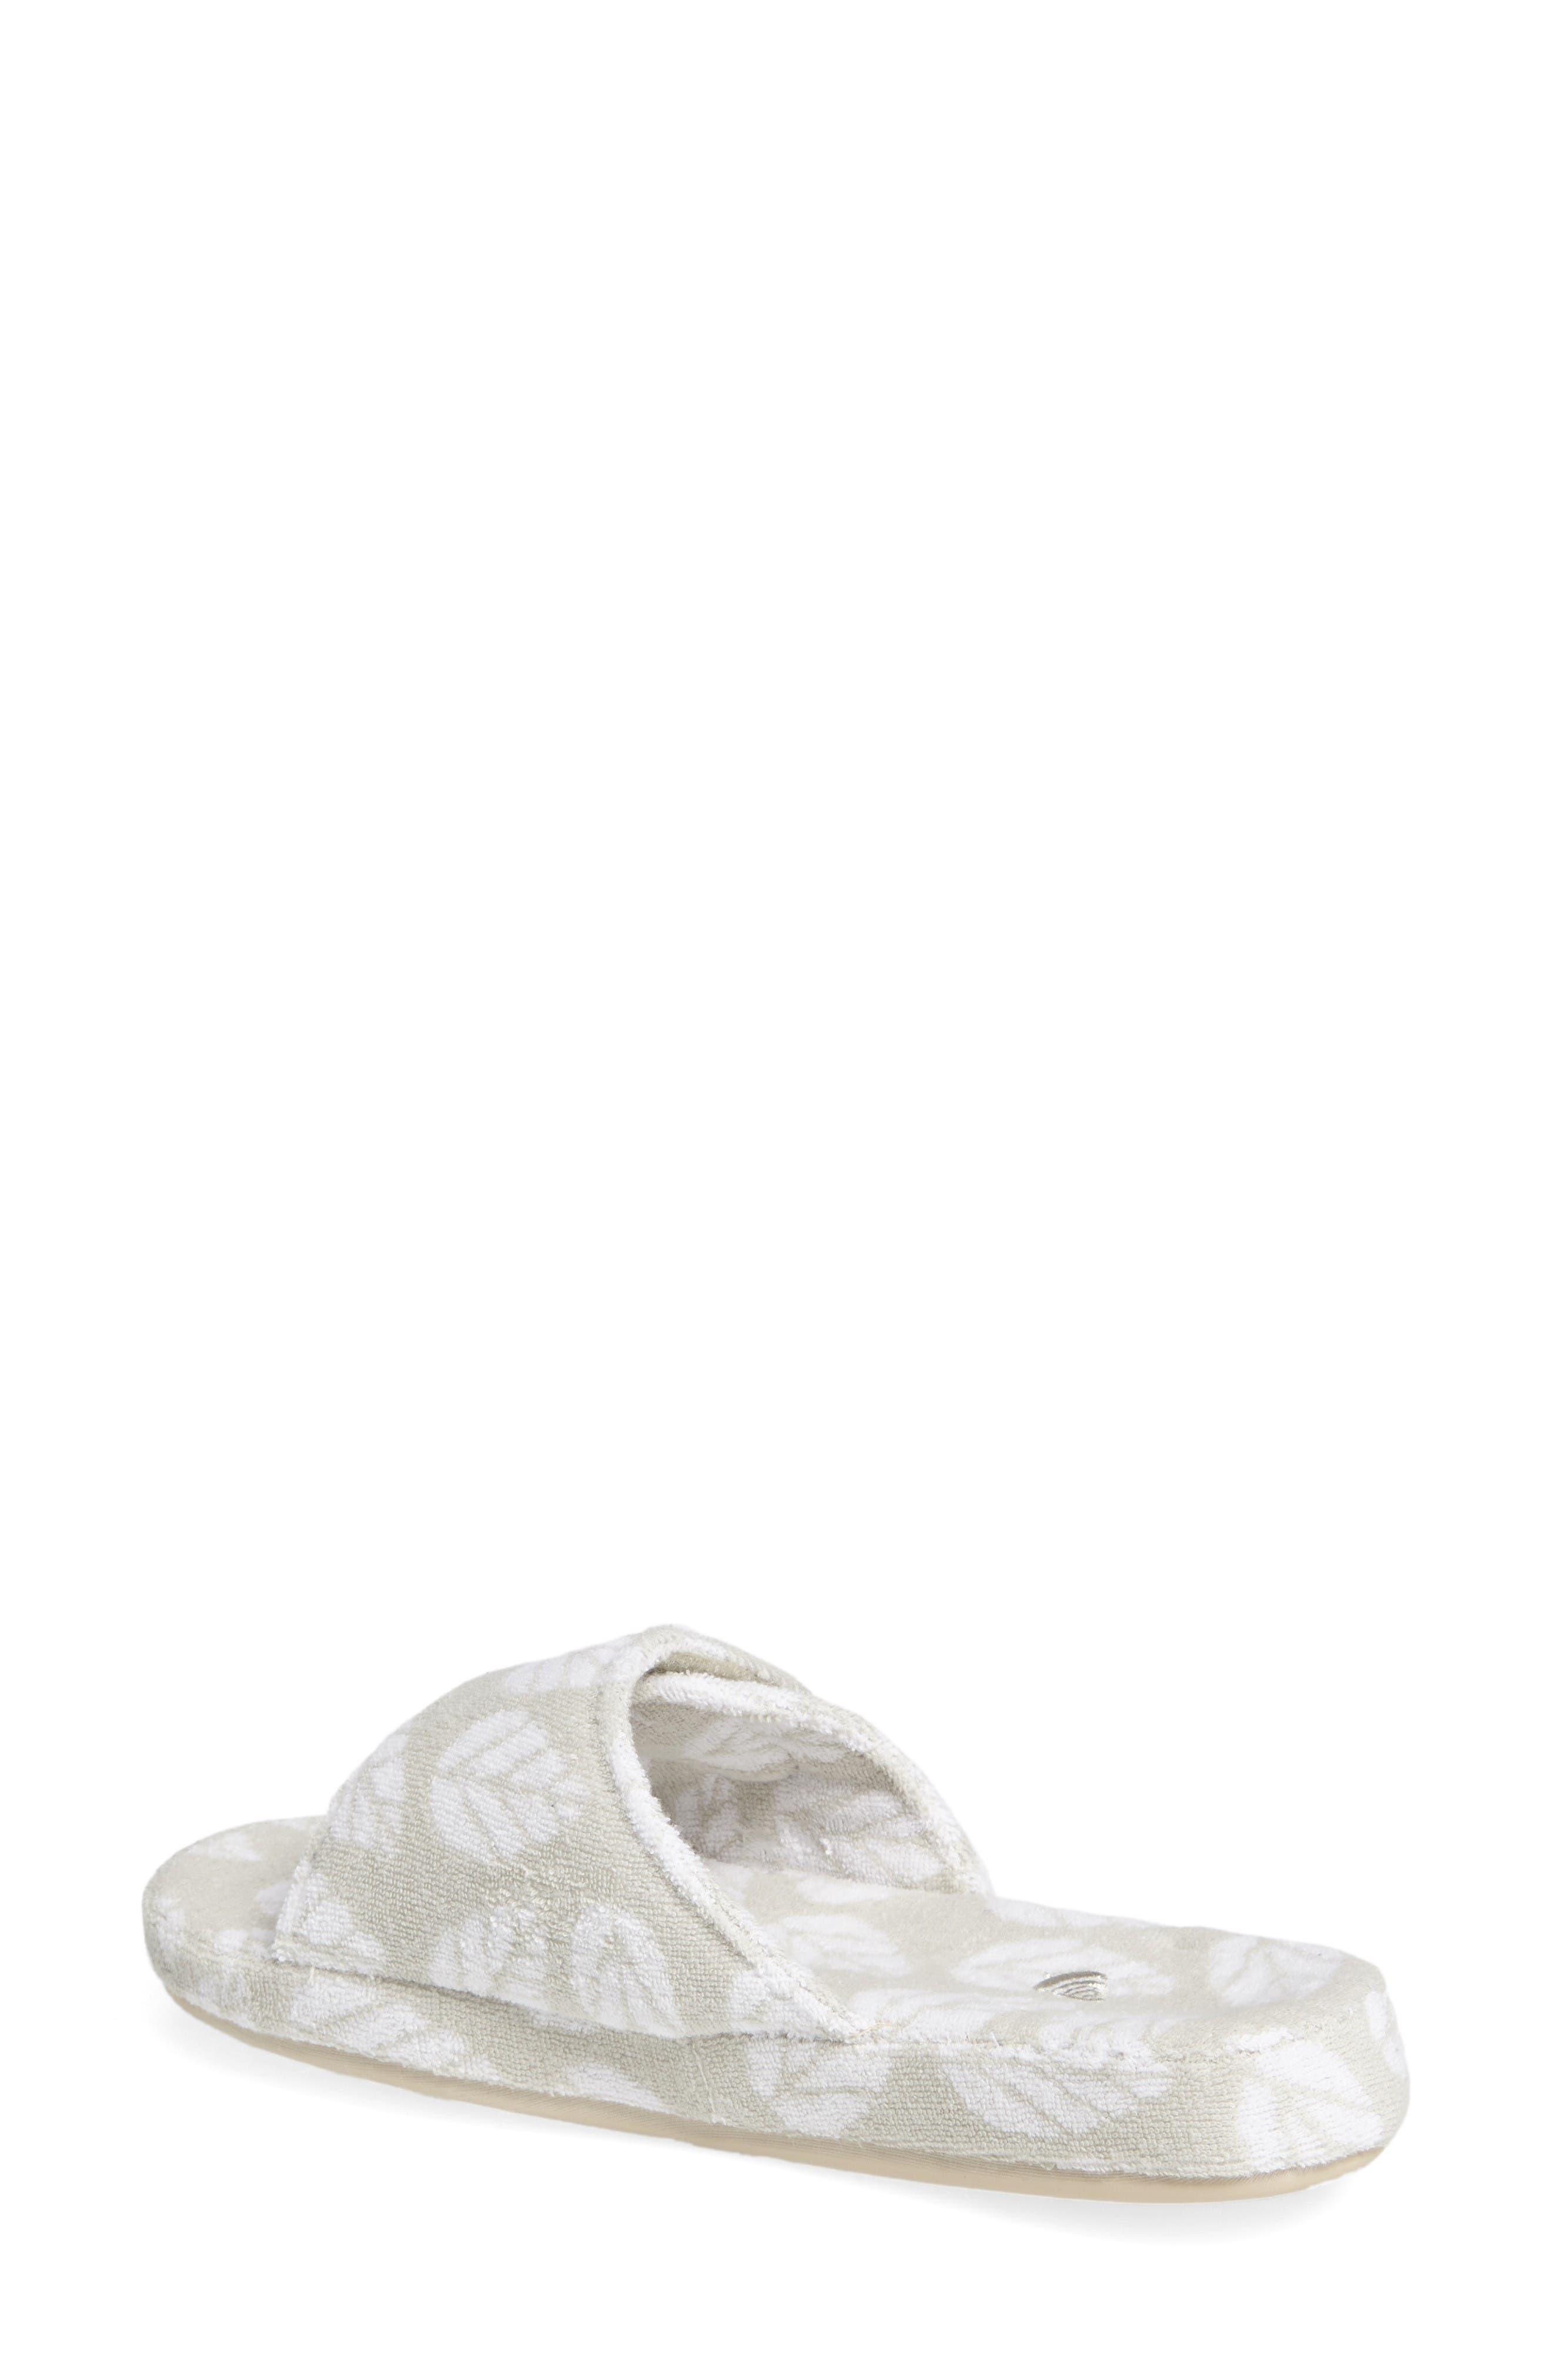 Summerweight Slide Spa Slipper,                             Alternate thumbnail 2, color,                             Grey Leaf Fabric